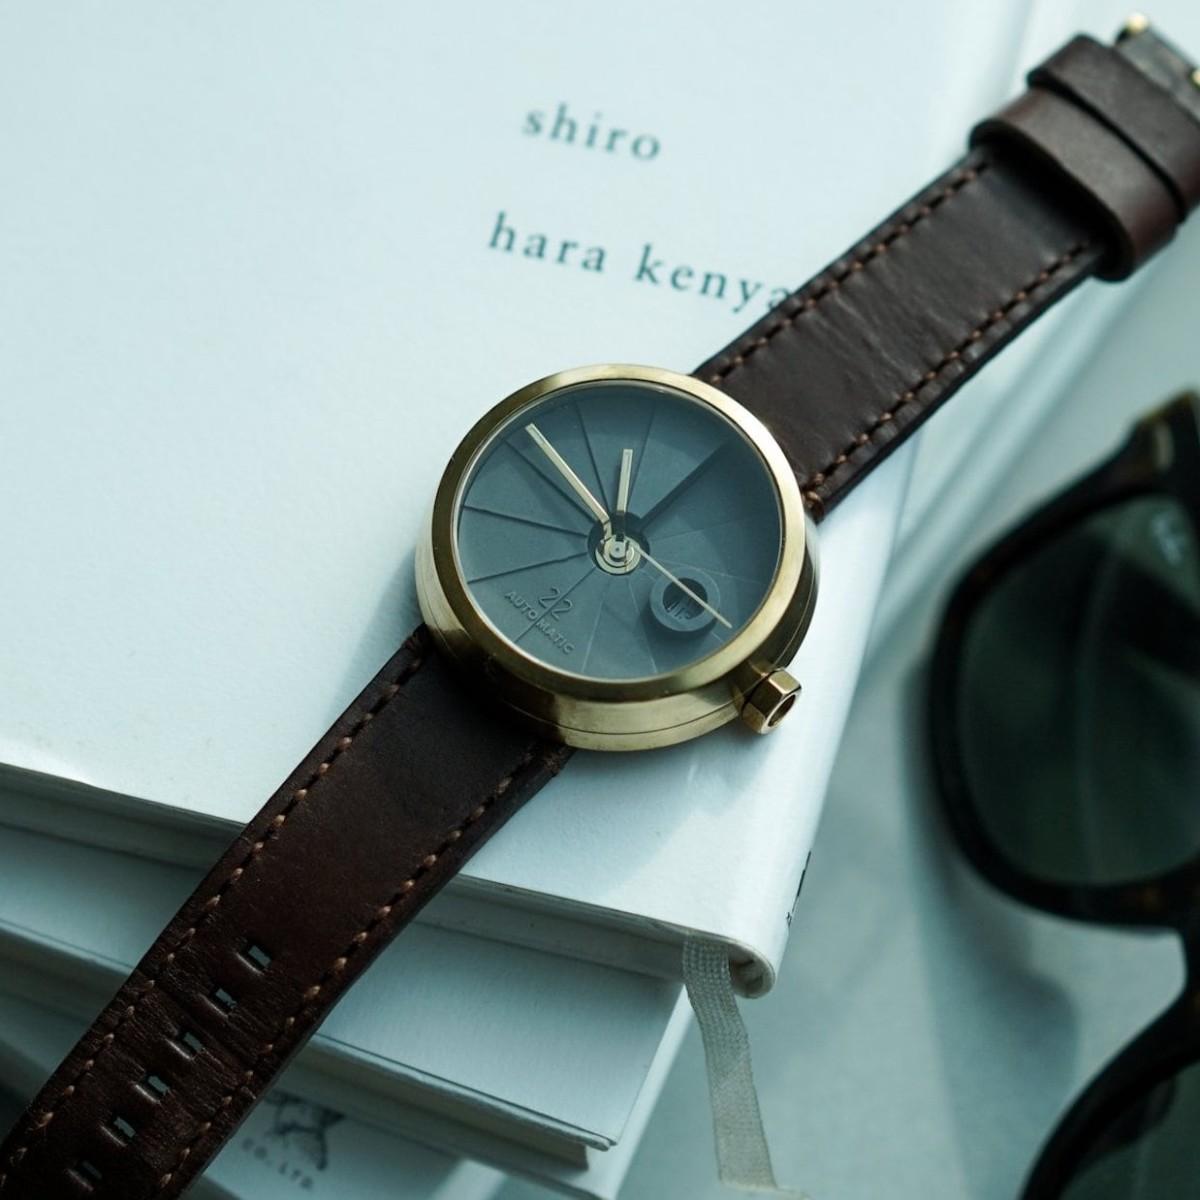 22STUDIO 4D Concrete Watch Brass Minimalist Timepiece is like wrist-worn architecture